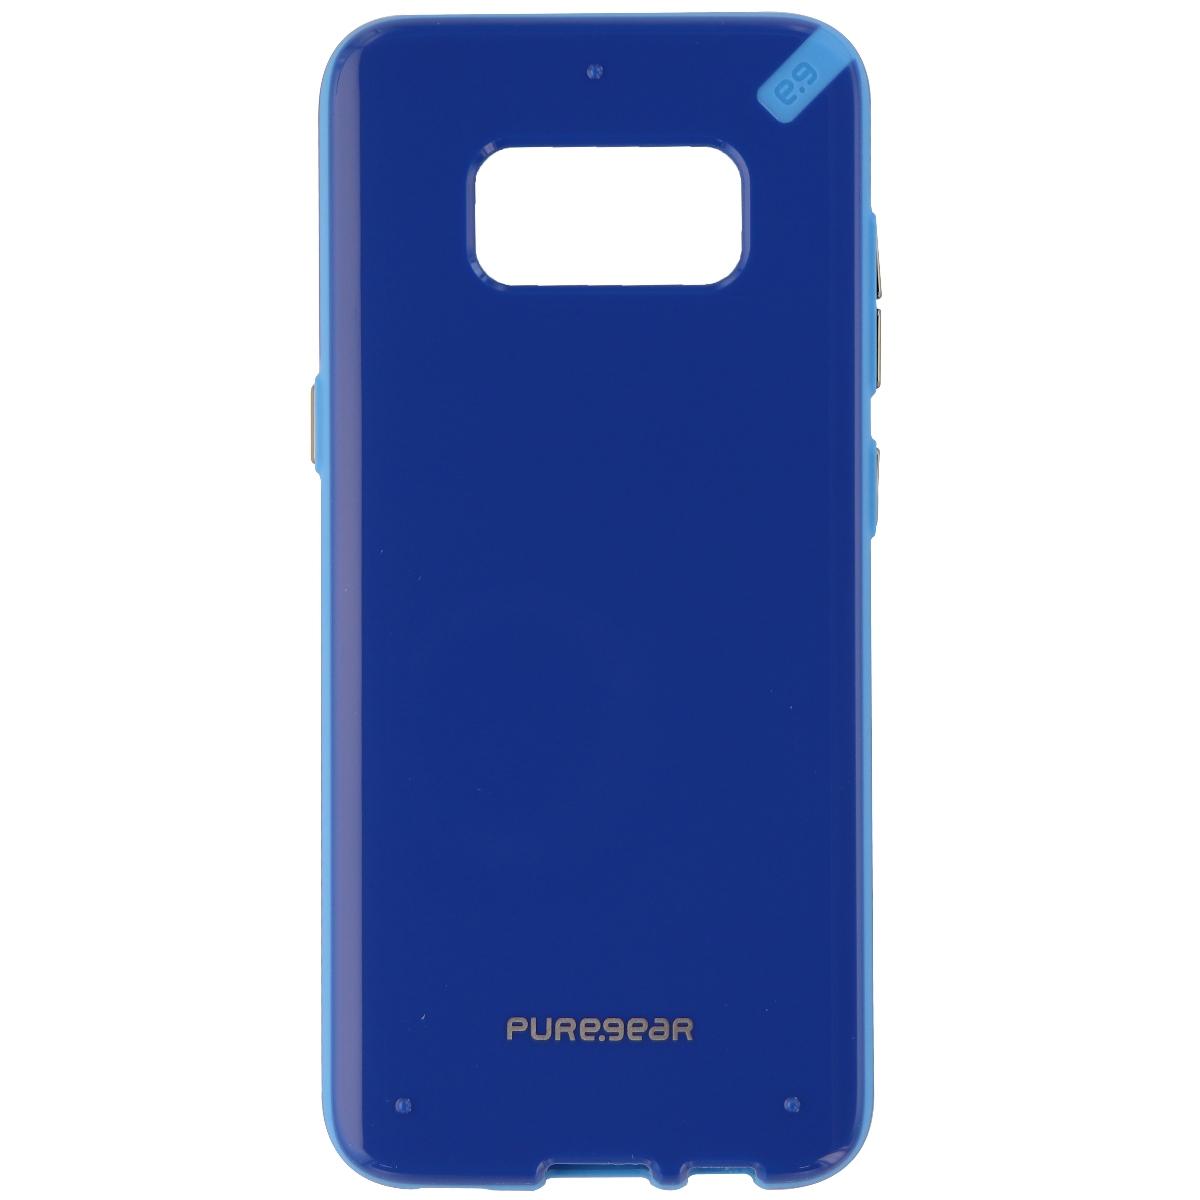 PureGear Slim Shell Series Hybrid Case for Samsung Galaxy S8 - Blue/Light Blue